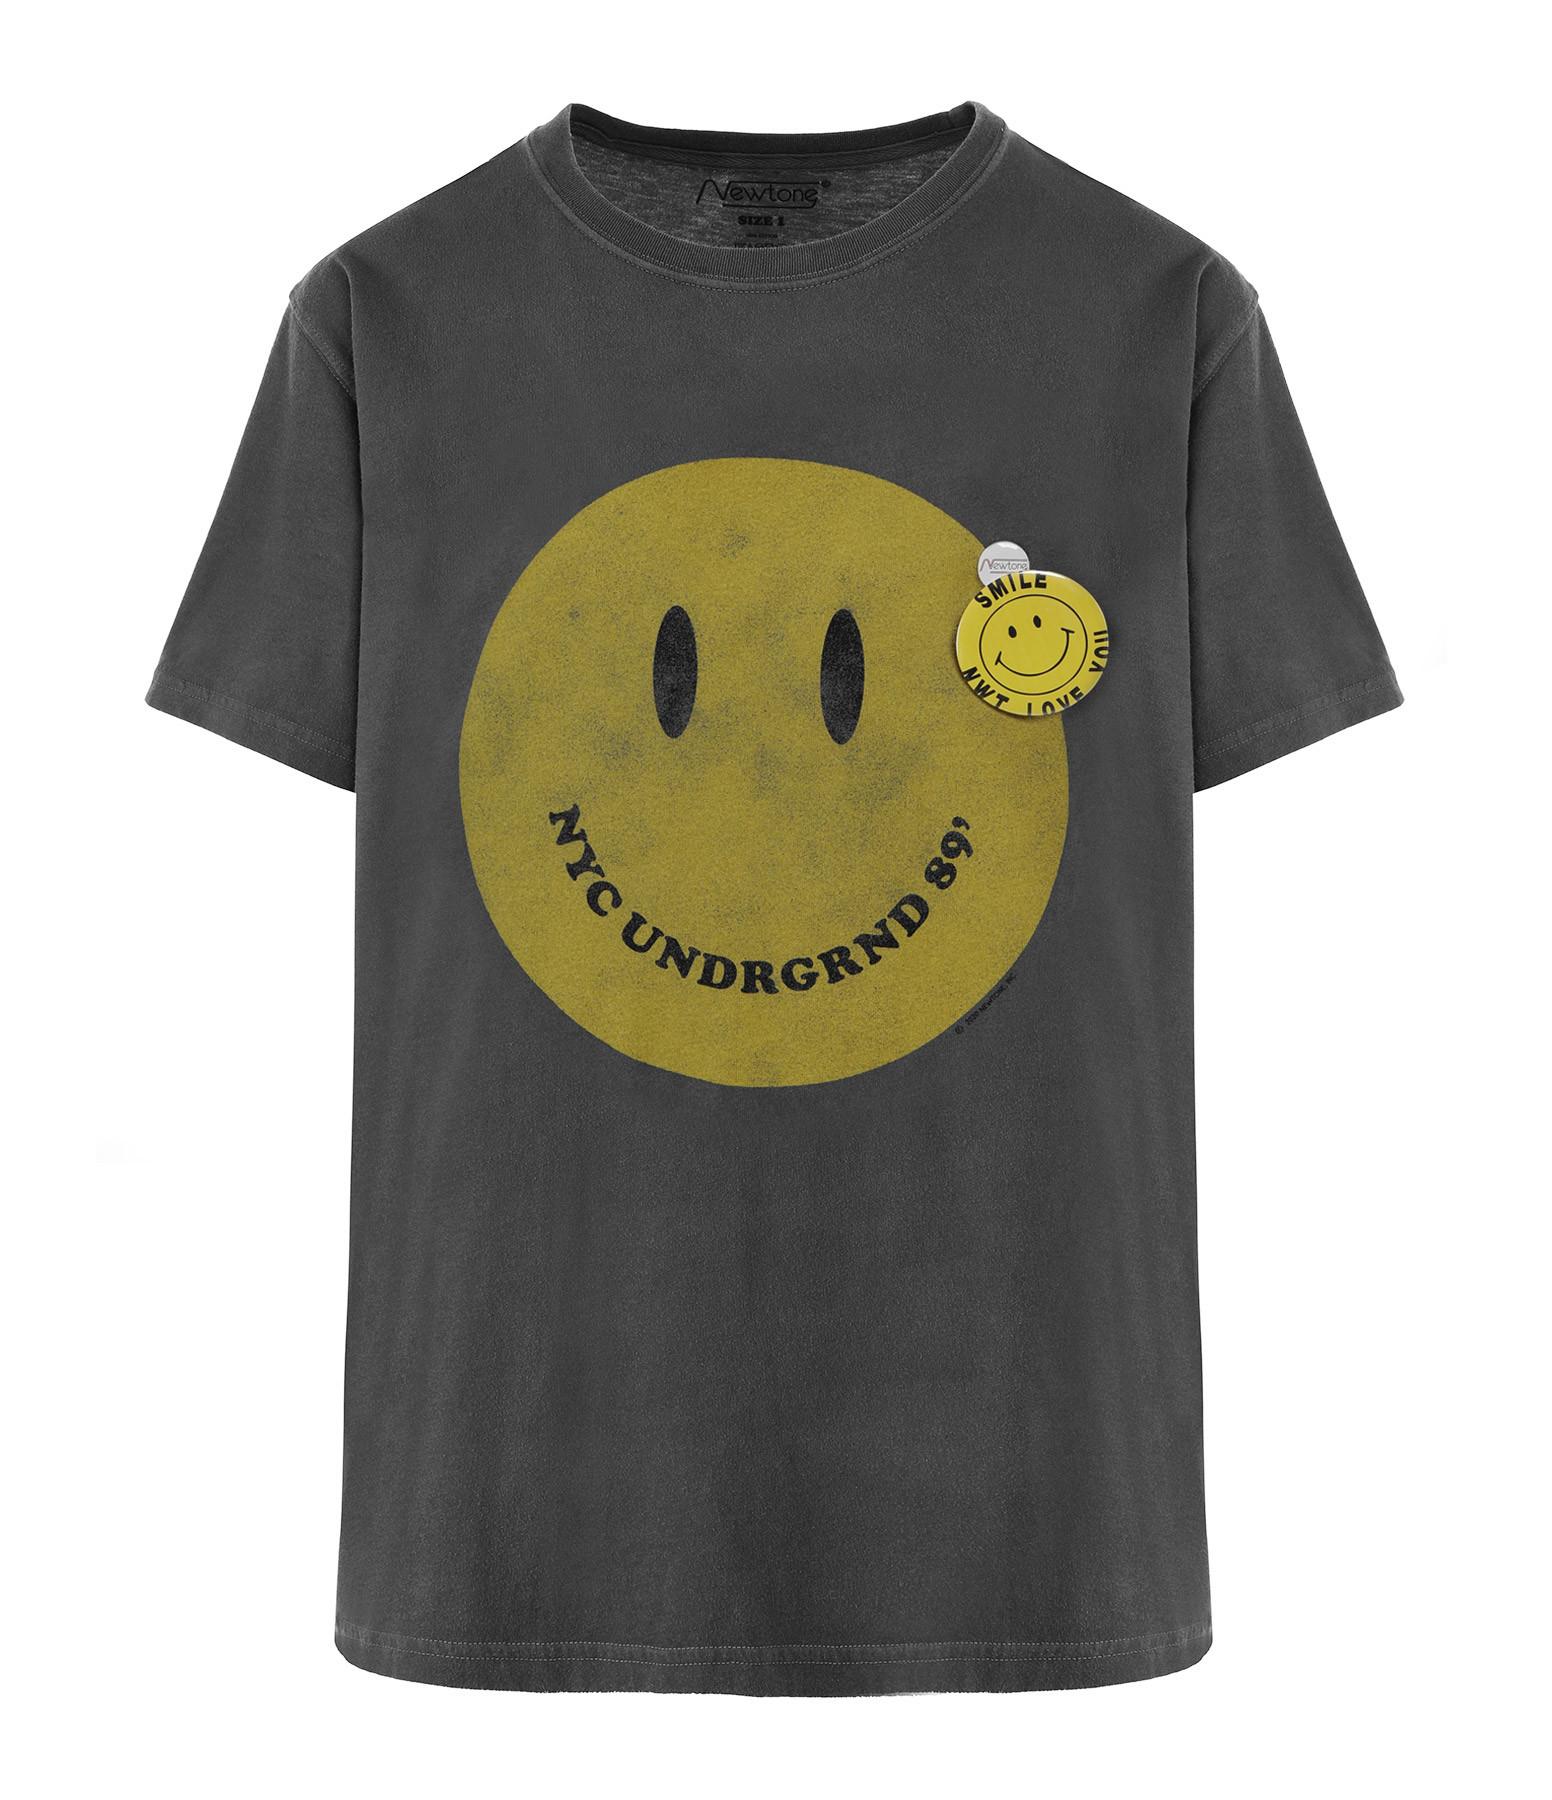 NEWTONE - Tee-shirt Smliey Coton Pepper